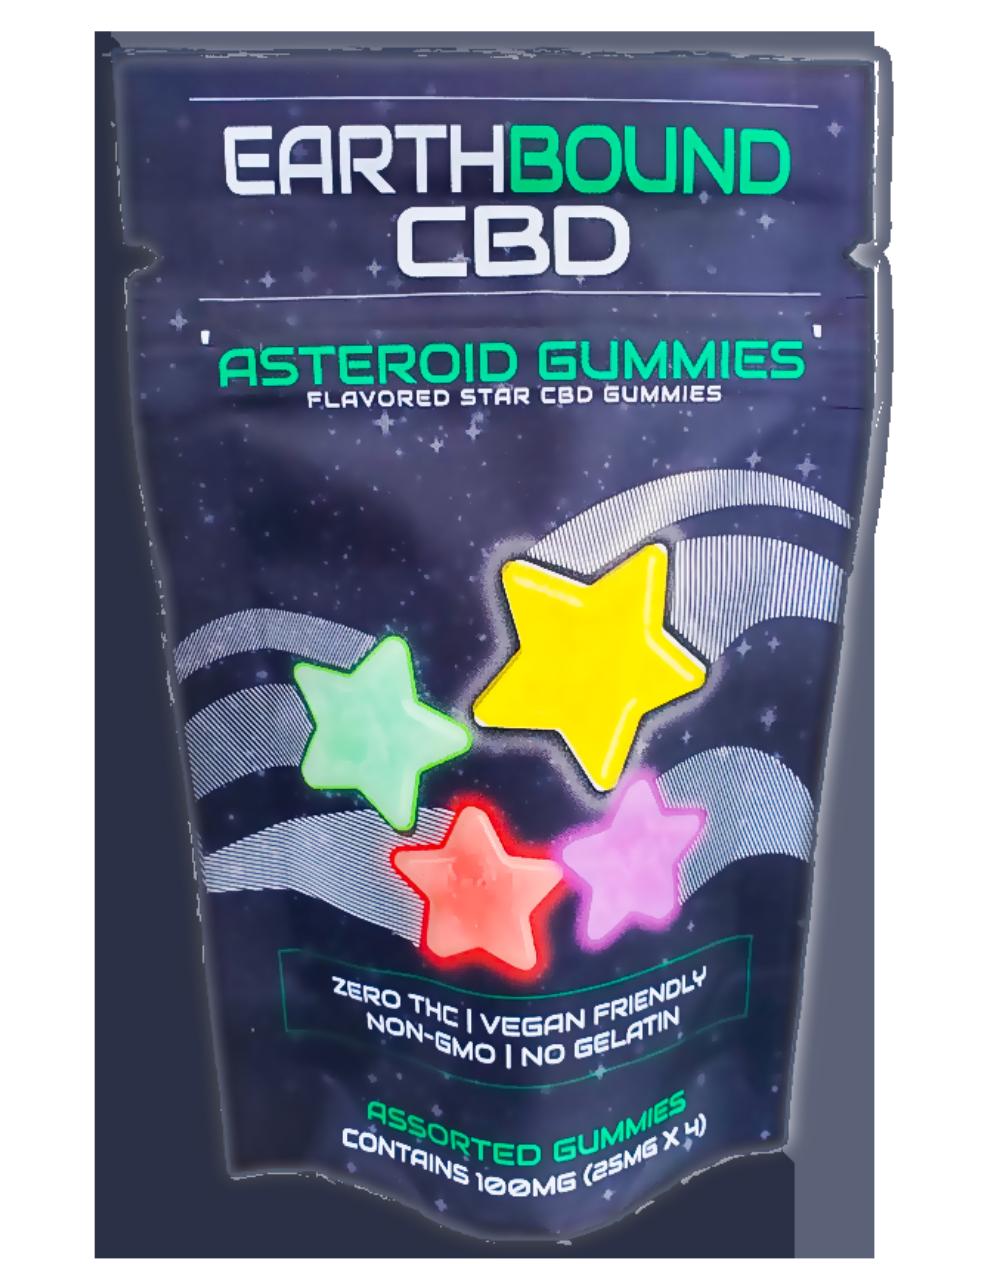 eb-asteroid-gummies-transparent-background